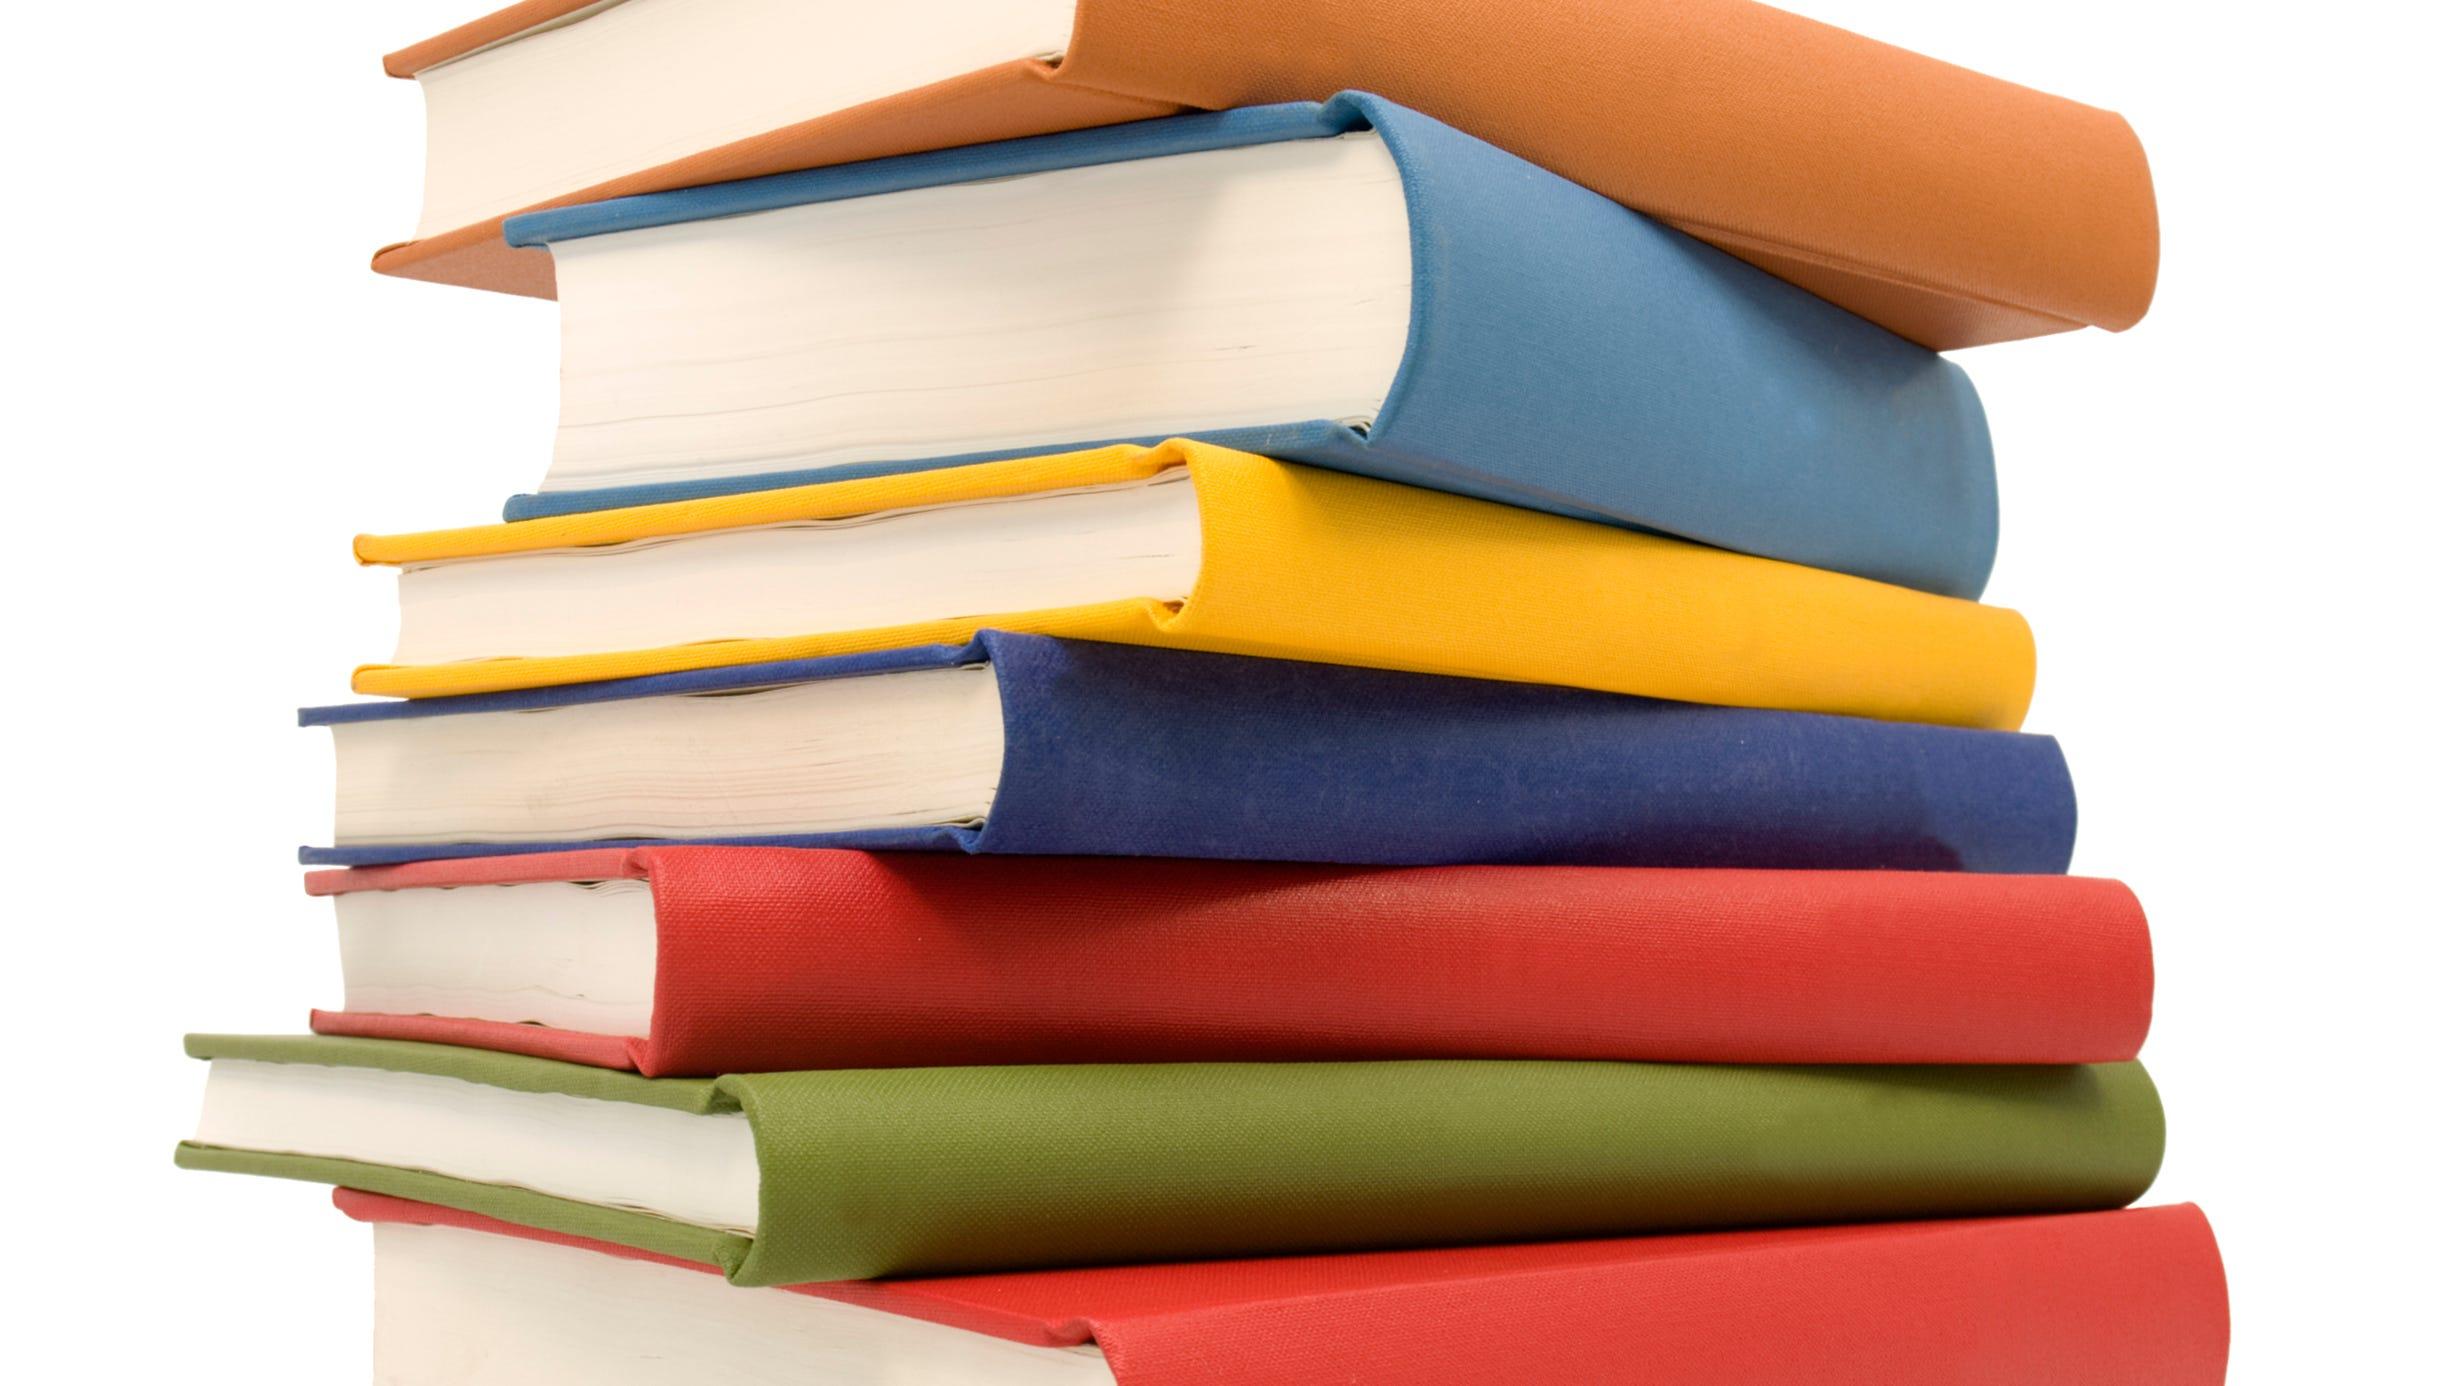 d25f200a-77c7-444b-aa43-30ef0e8158e5-Books.jpg (2981×1680)